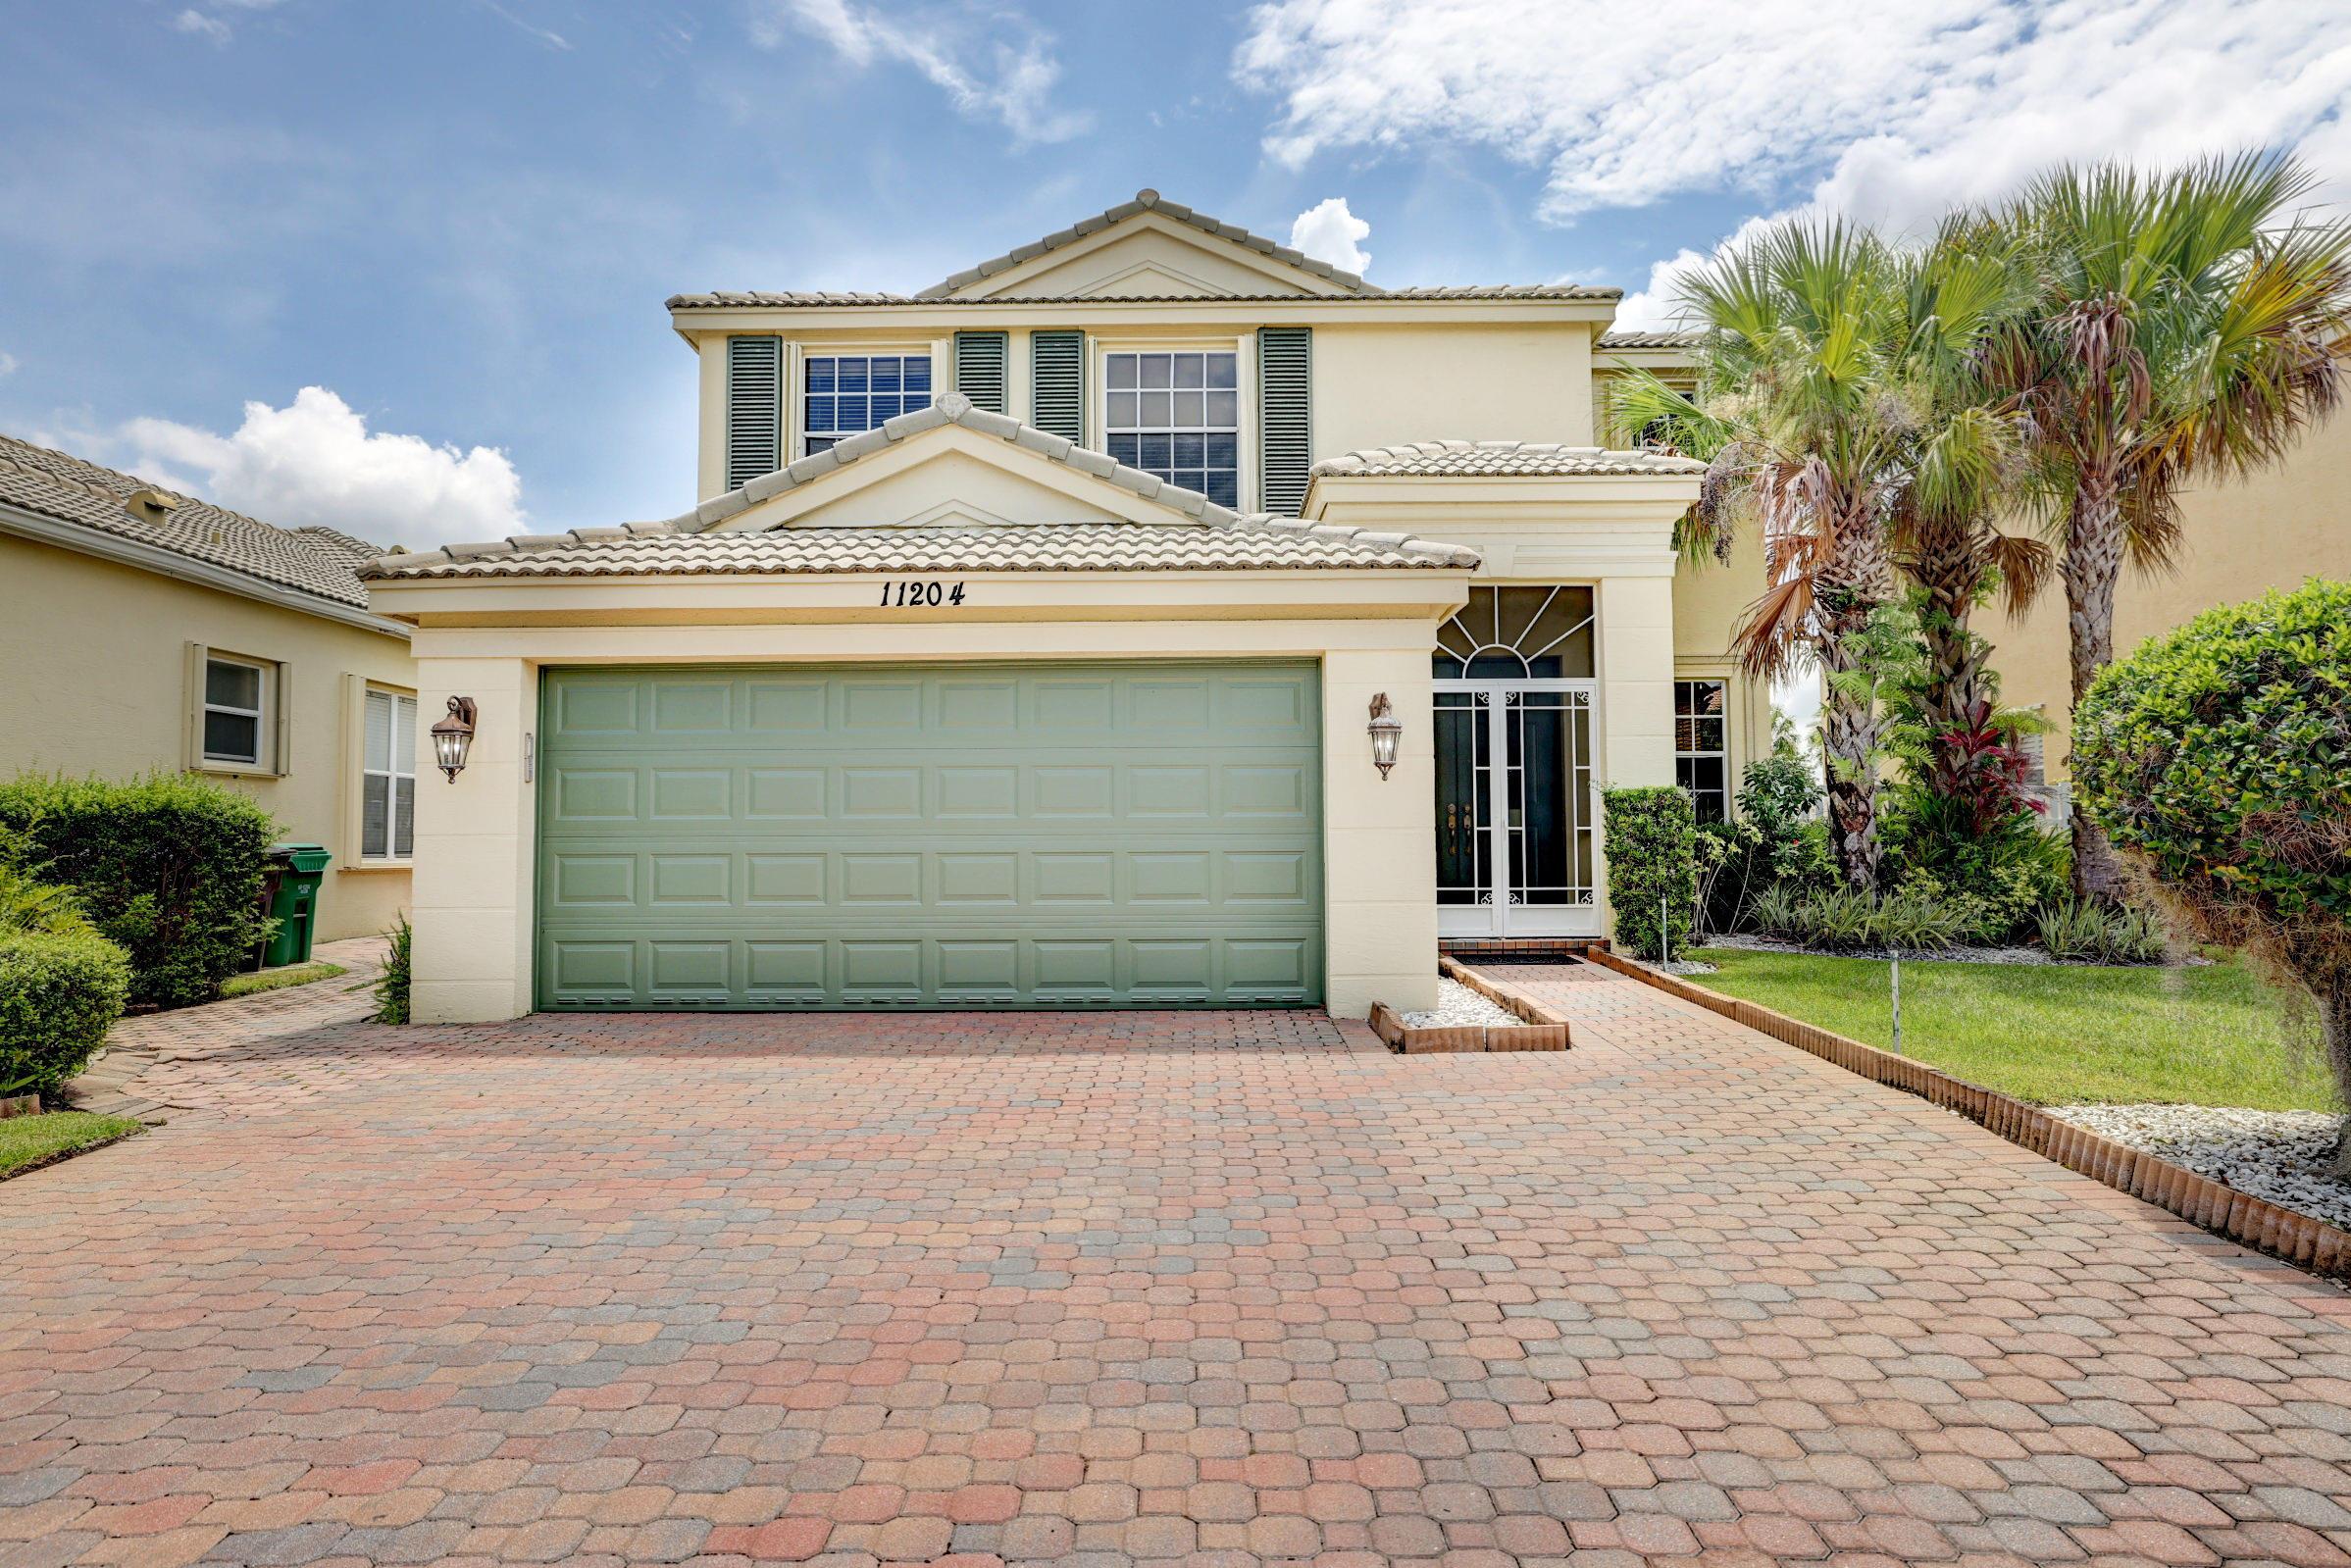 11204 Sw Kingslake Circle, Port Saint Lucie, FL 34987